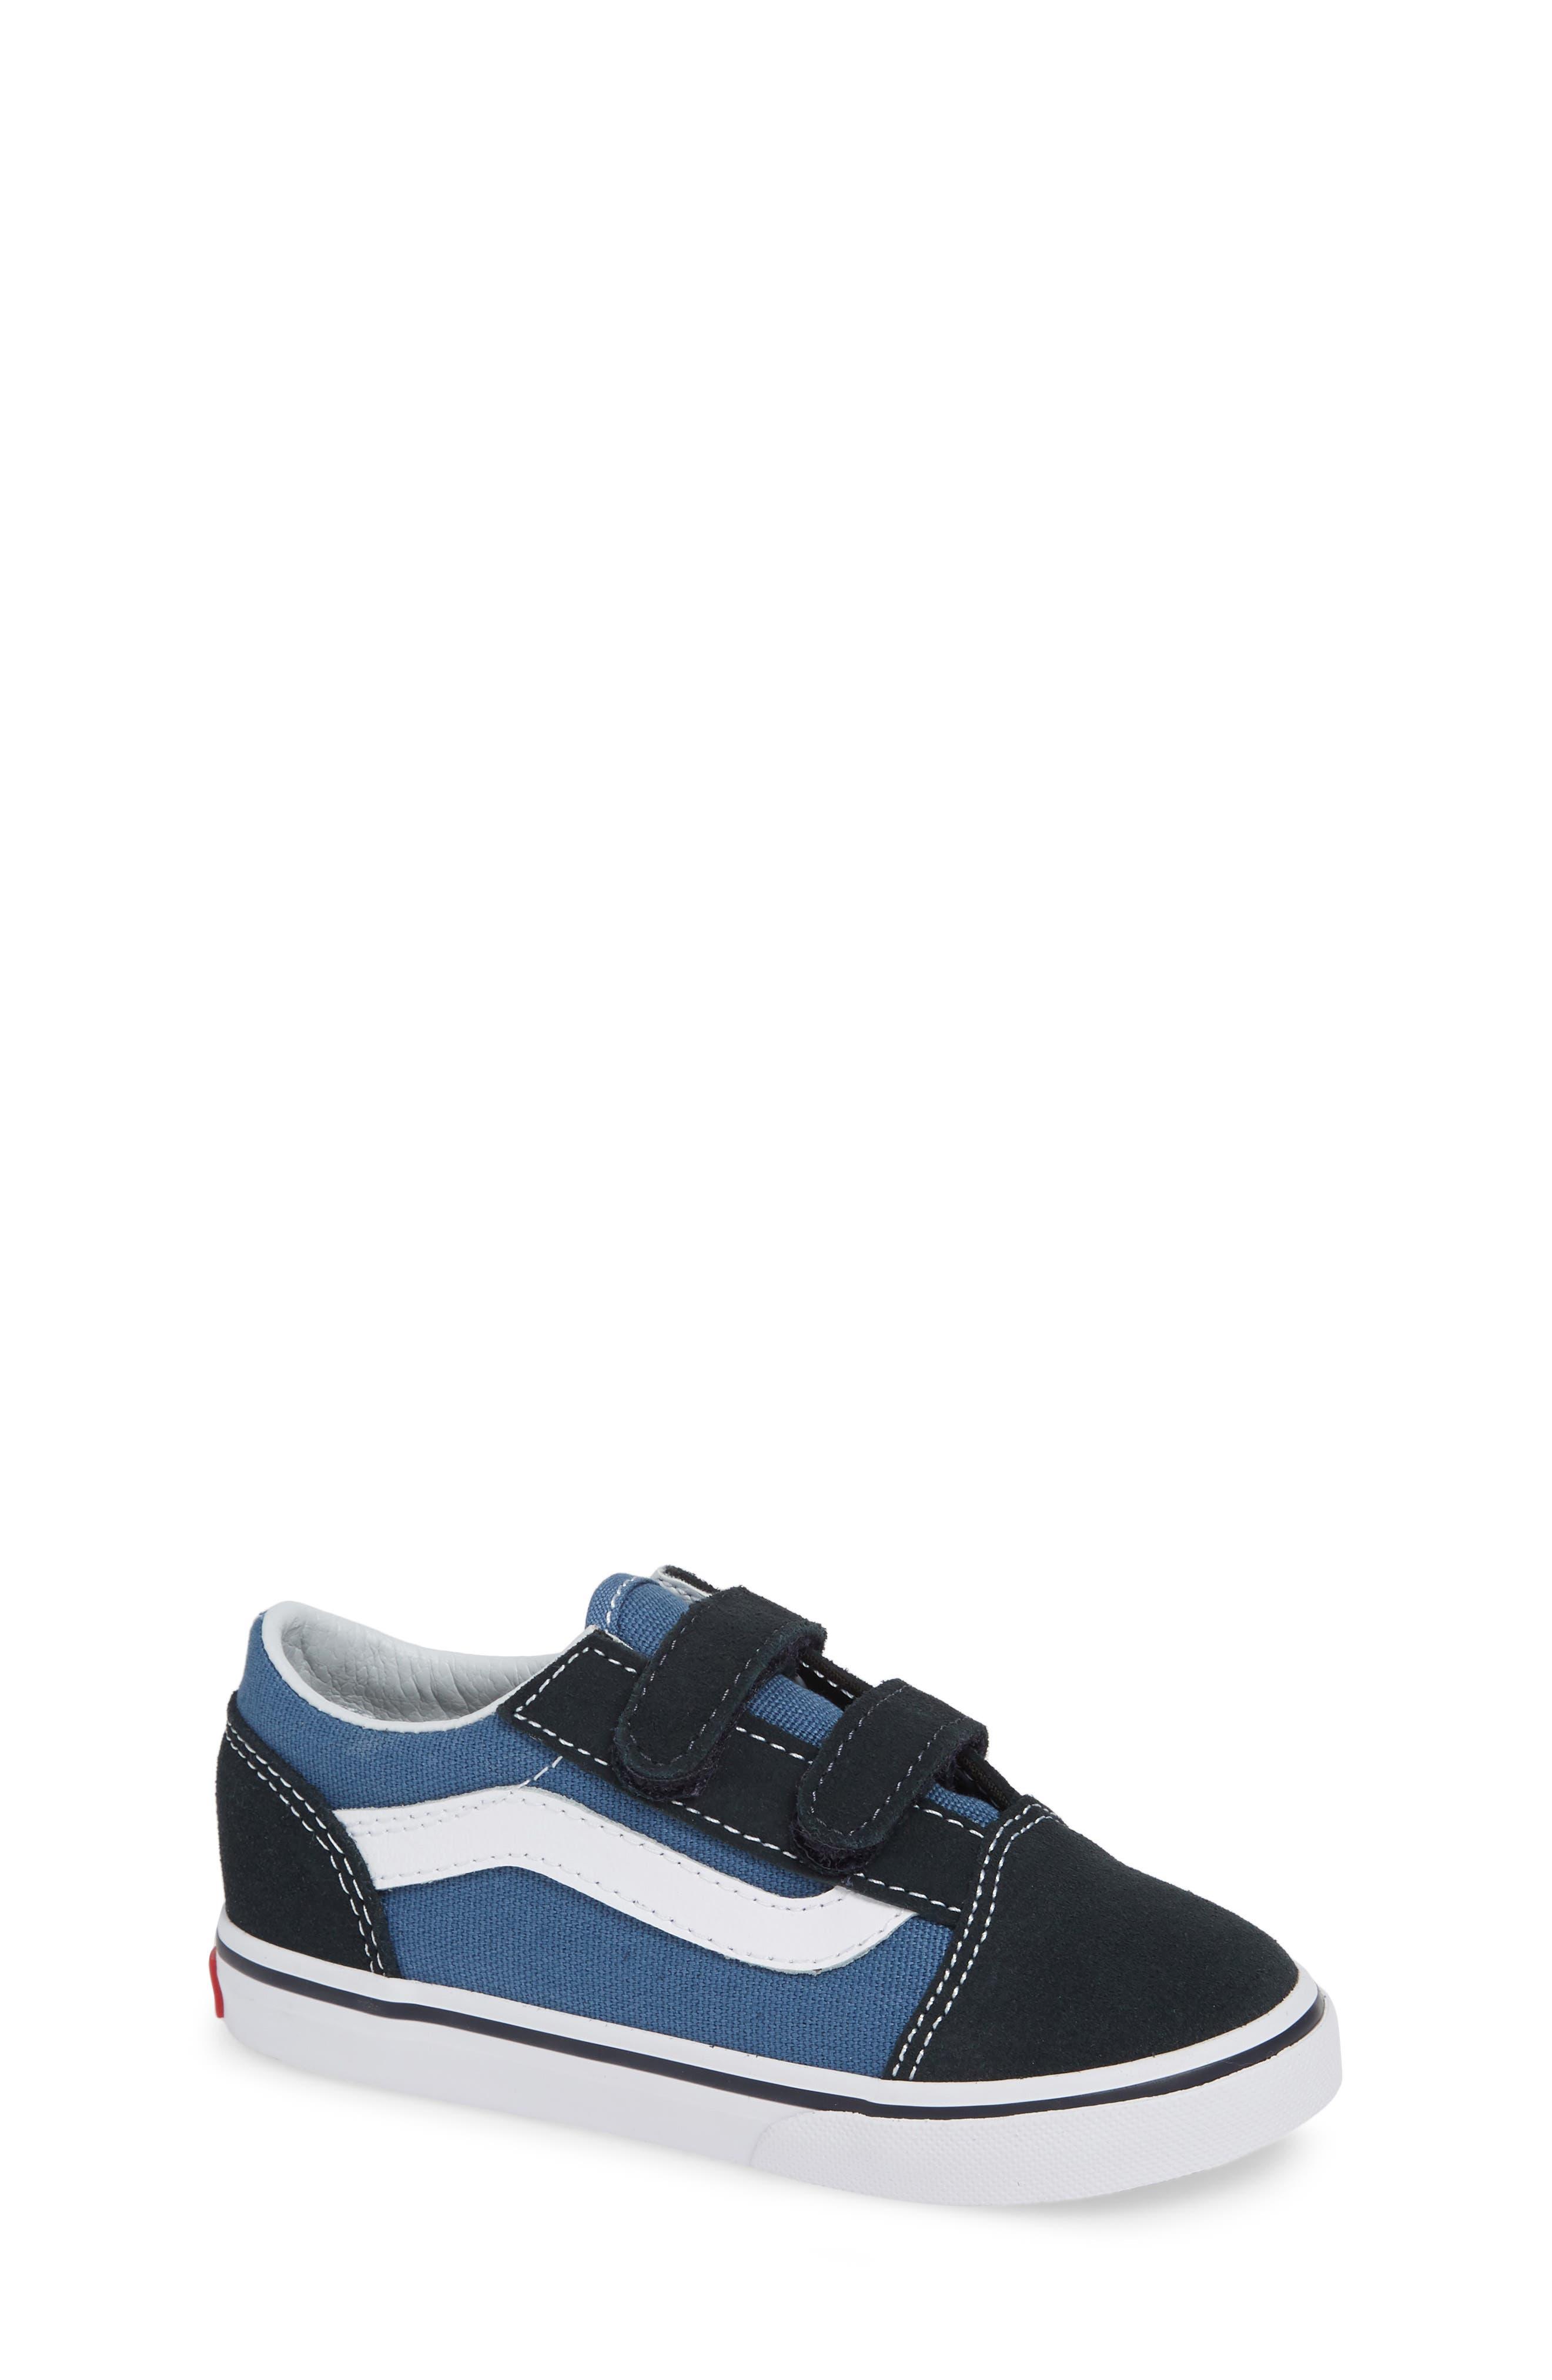 'Old Skool' Sneaker,                             Main thumbnail 1, color,                             NAVY